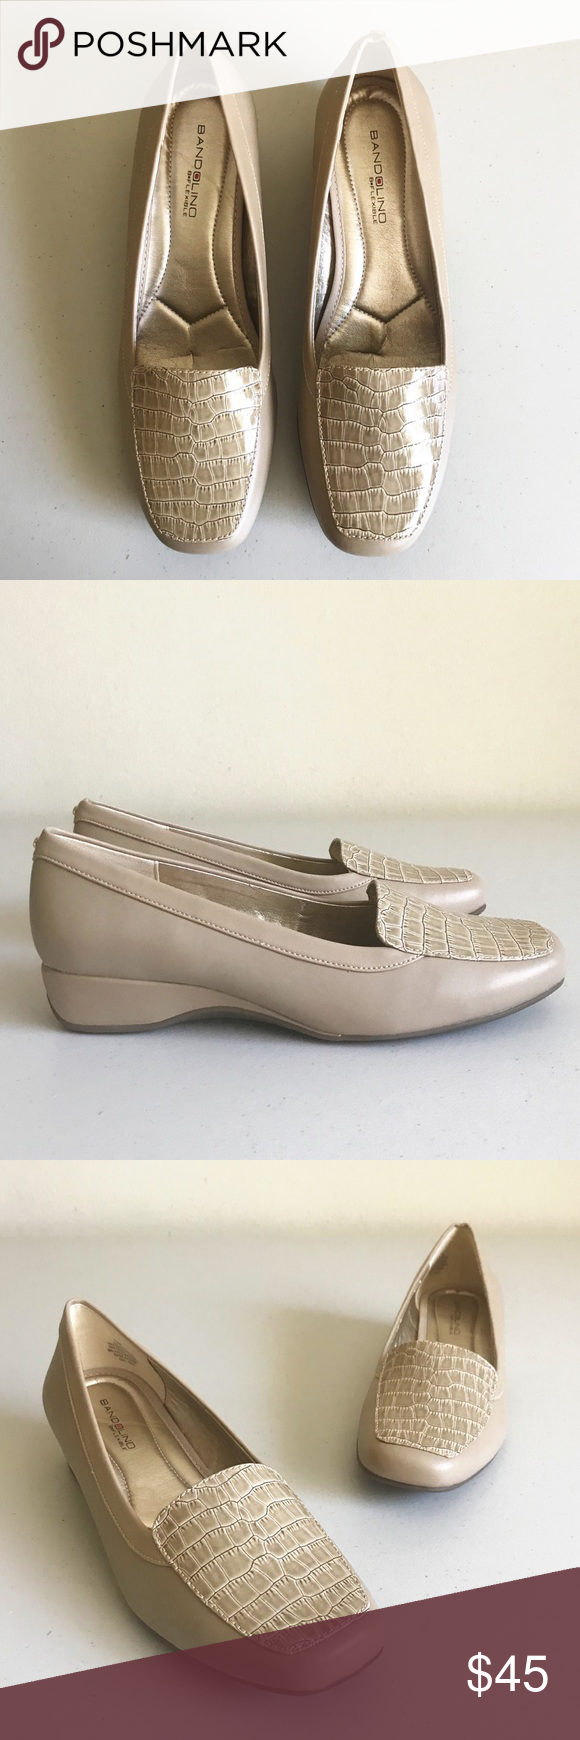 5da56e4216c Bandolino   Lilas  Low Wedge Slip-On Loafer Condition  New with box ...